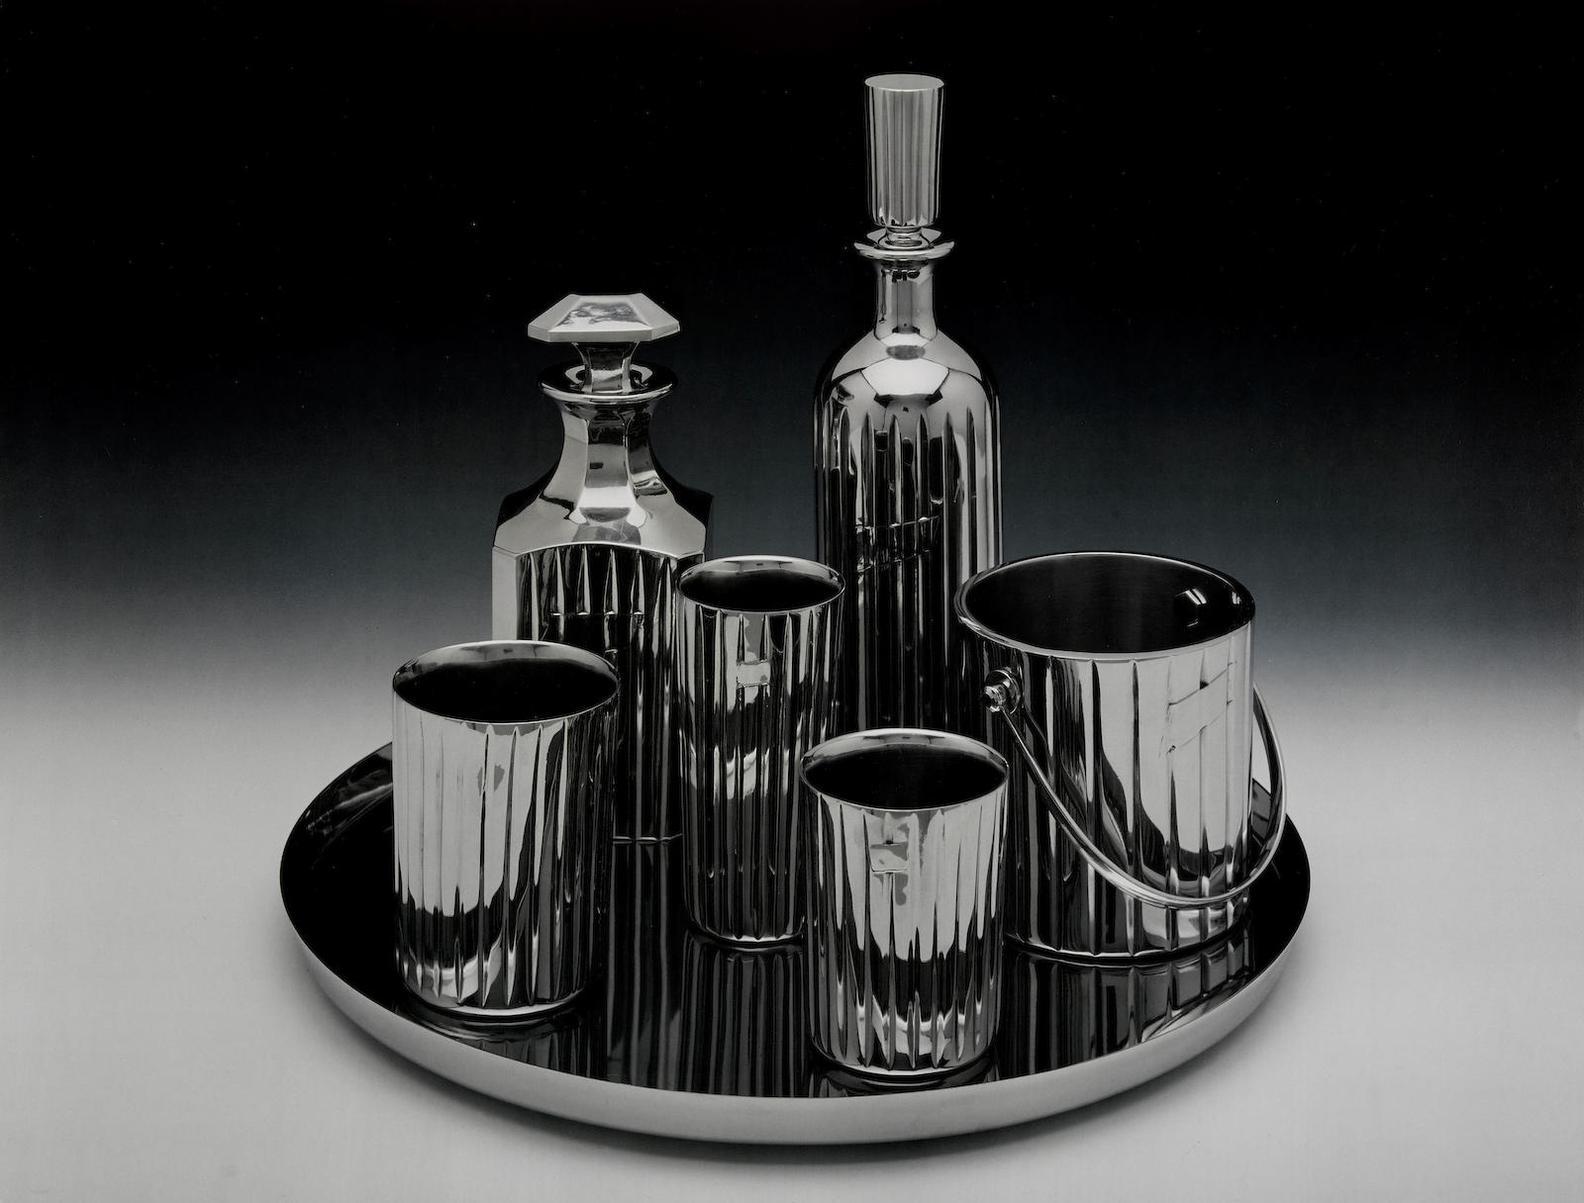 Jeff Koons-Luxury And Degradation-1986